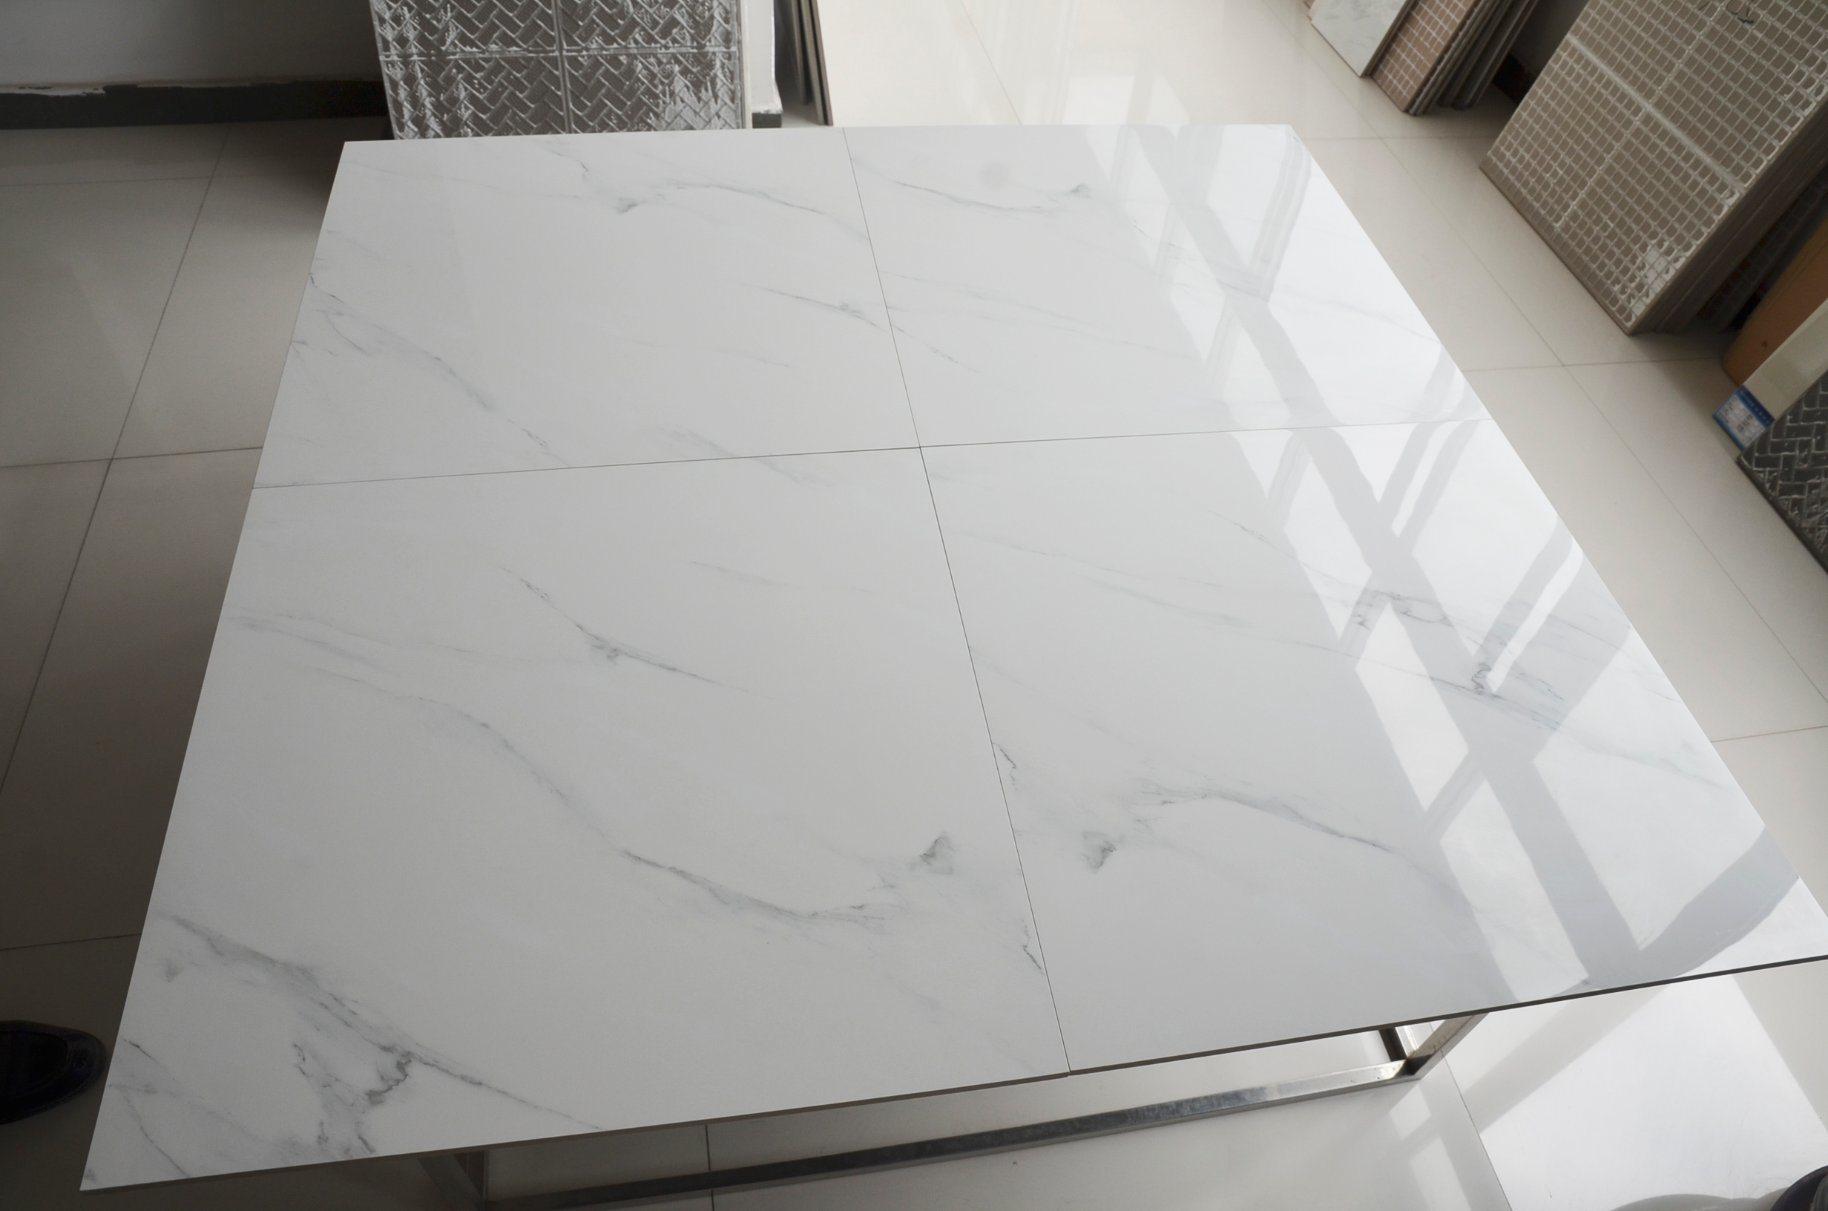 China South Korea Elegant Glazed Porcelain Clay Ceramic Bathroom - Porcelain or ceramic tile for bathroom floor